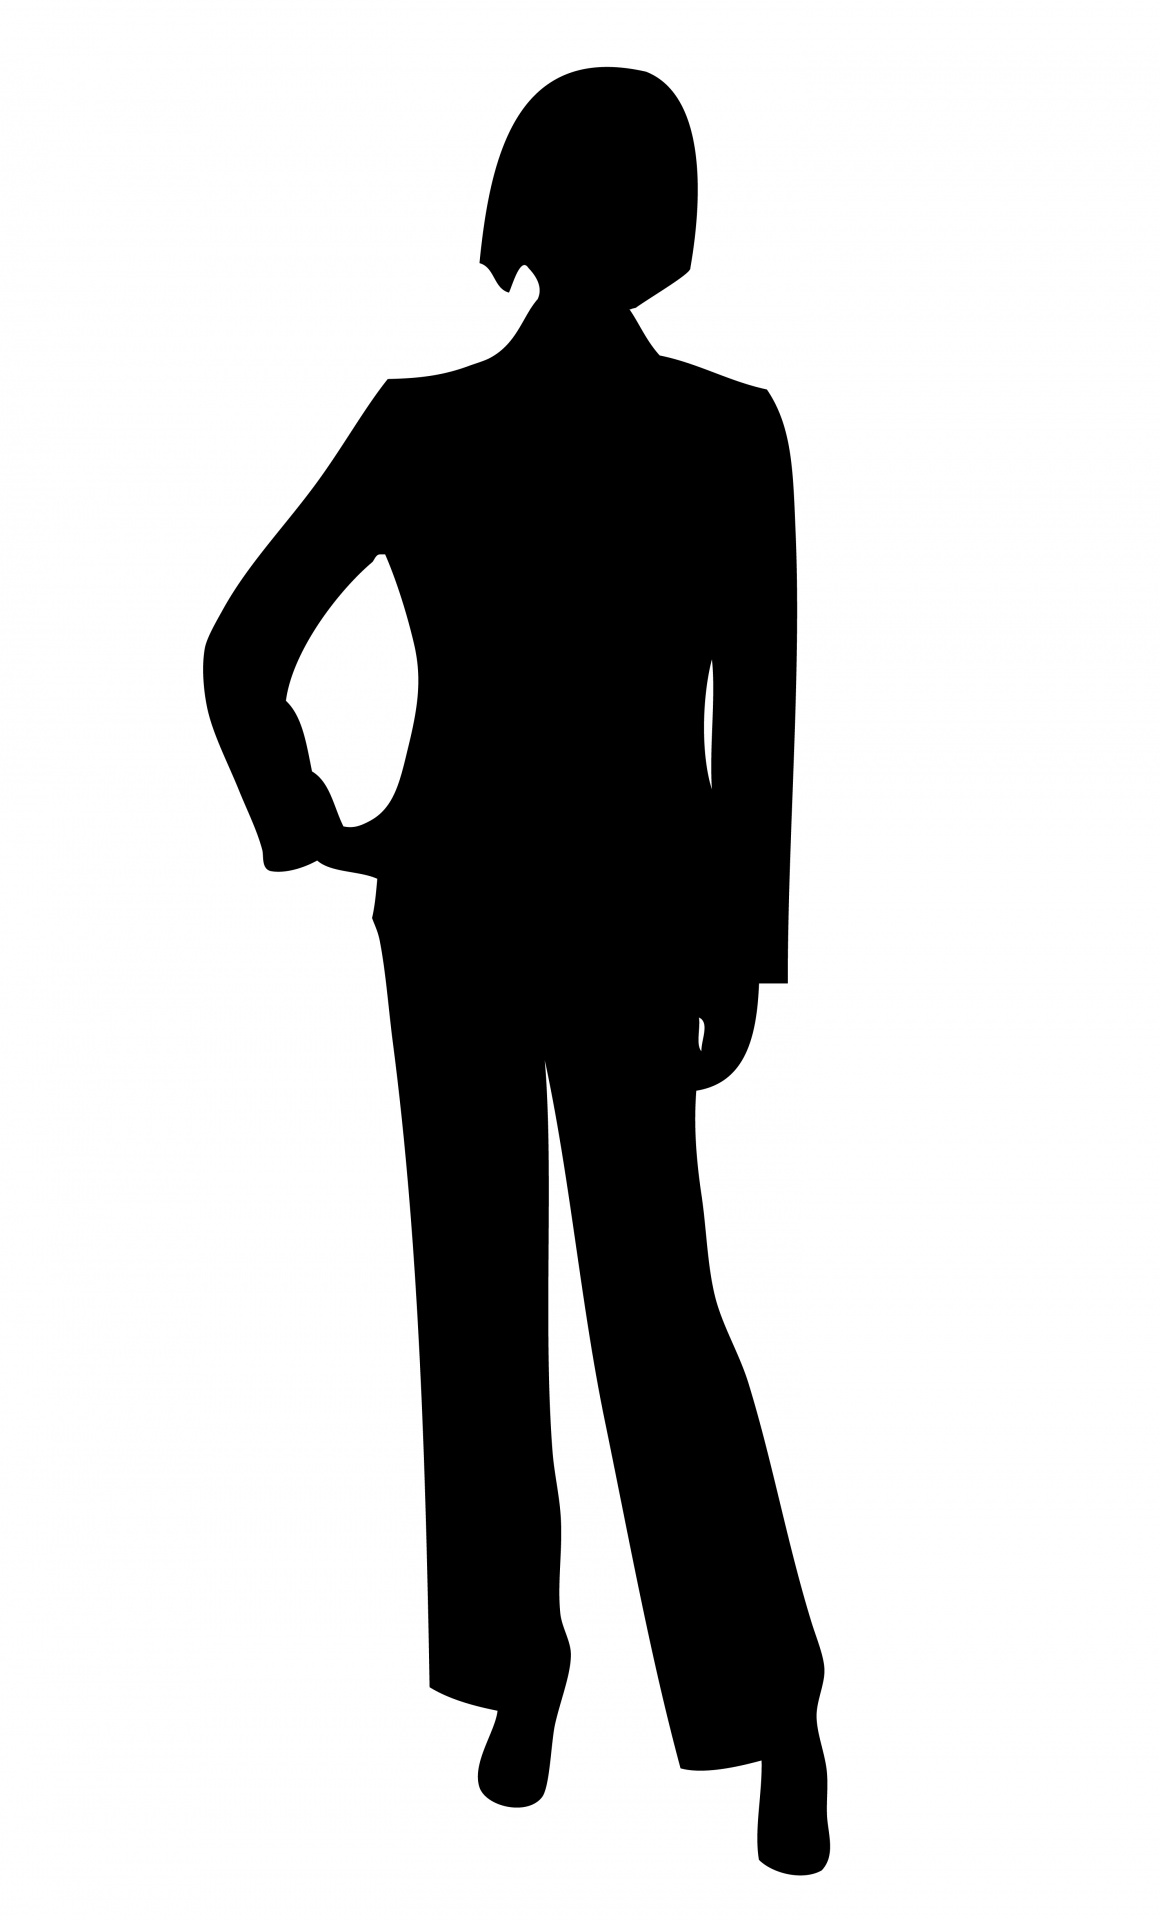 female silhouette art at getdrawings com free for personal use rh getdrawings com female head silhouette clip art female silhouette clip art free